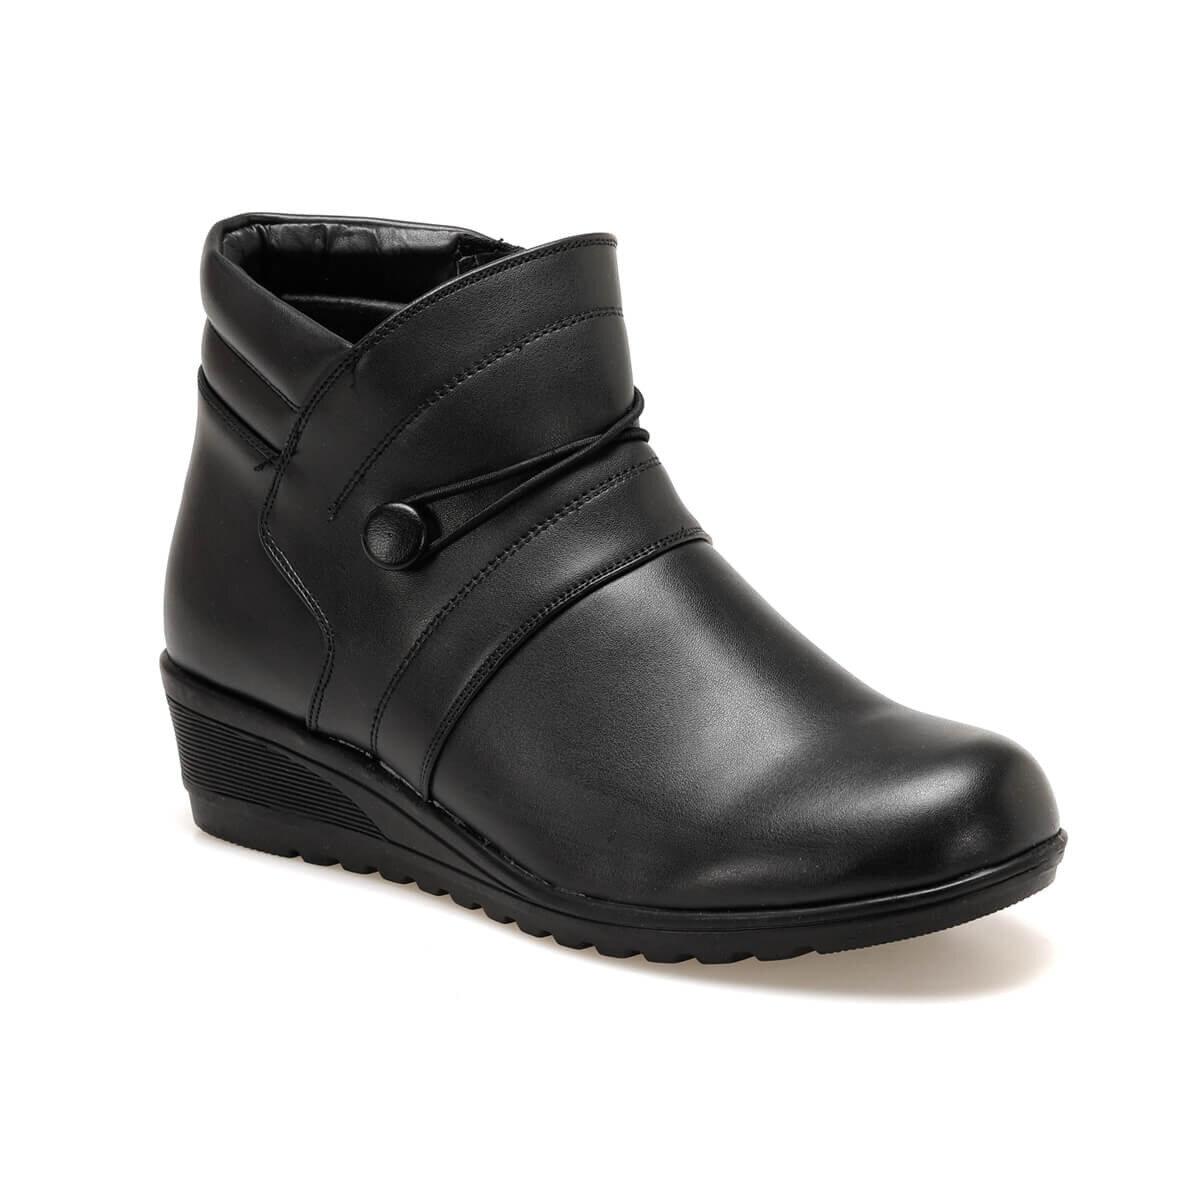 FLO 92.150365.Z Black Women Boots Polaris